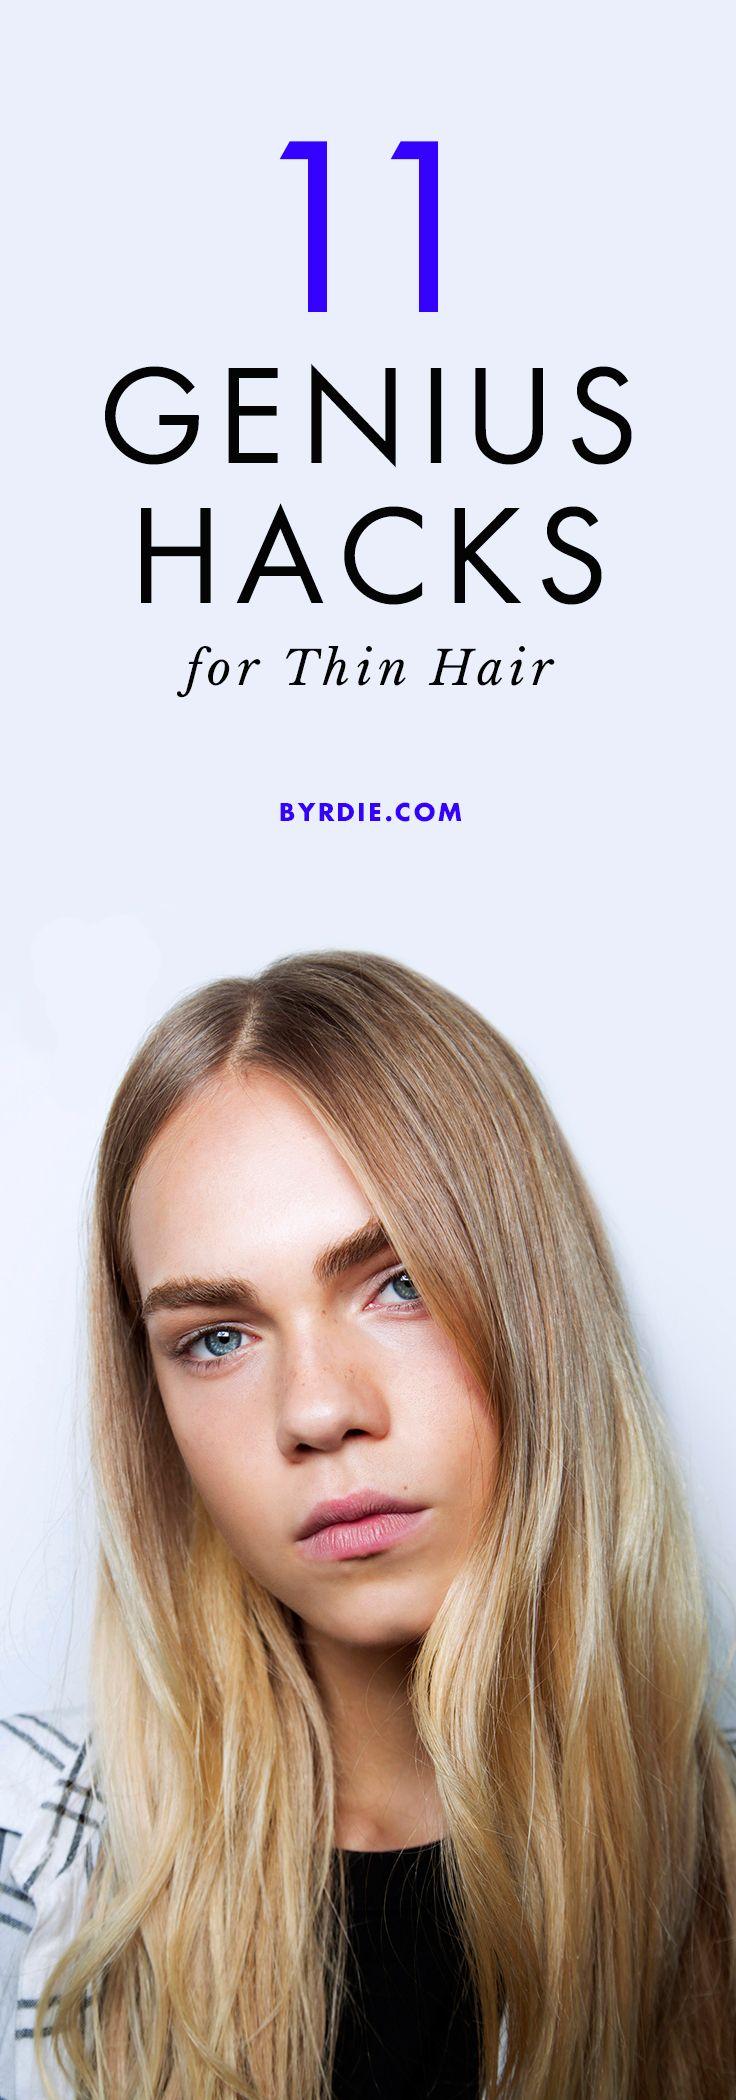 11 hair hacks for fine, thin strands